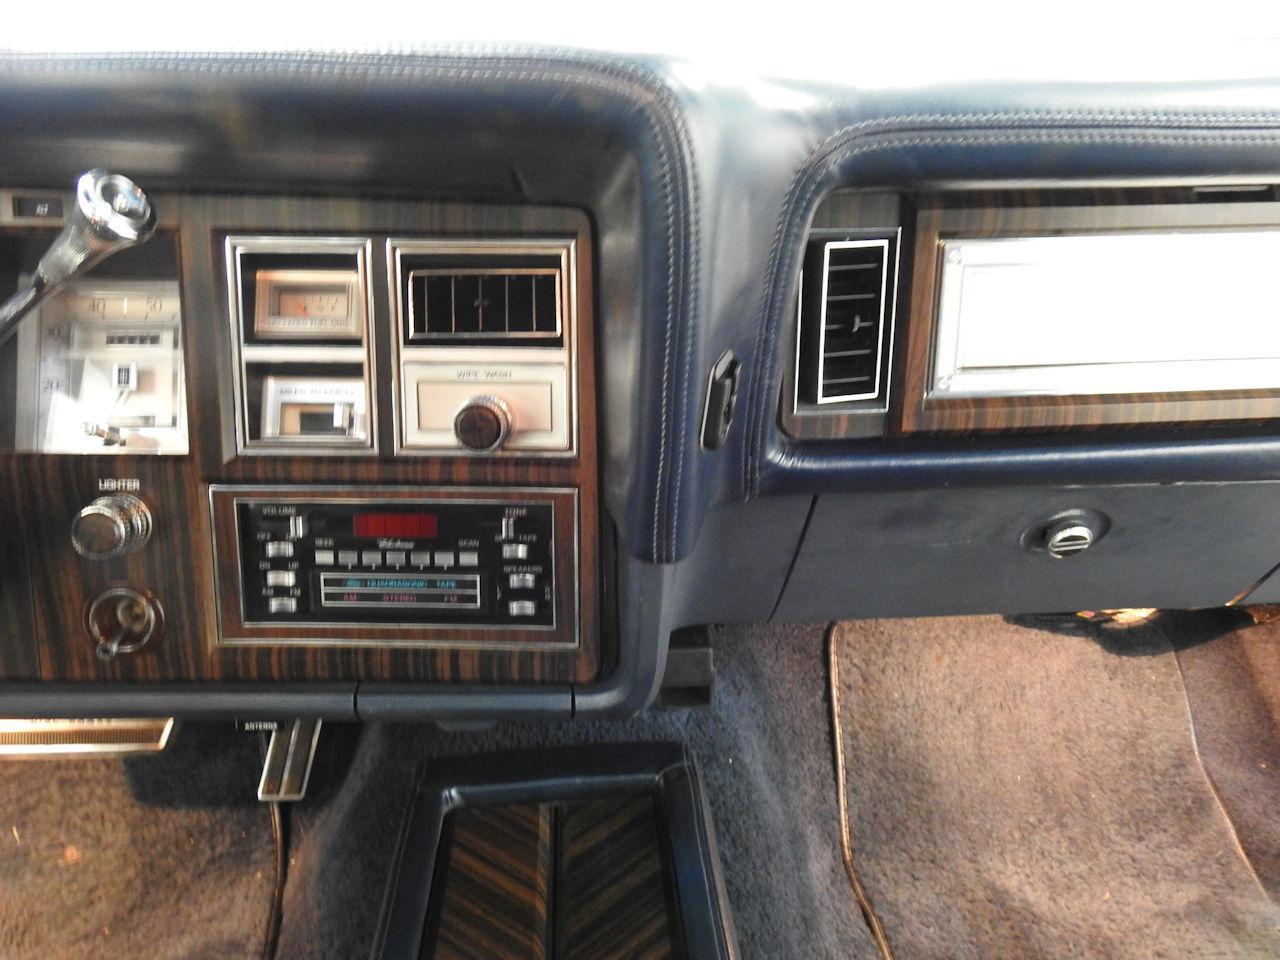 1979 Lincoln MKV 60